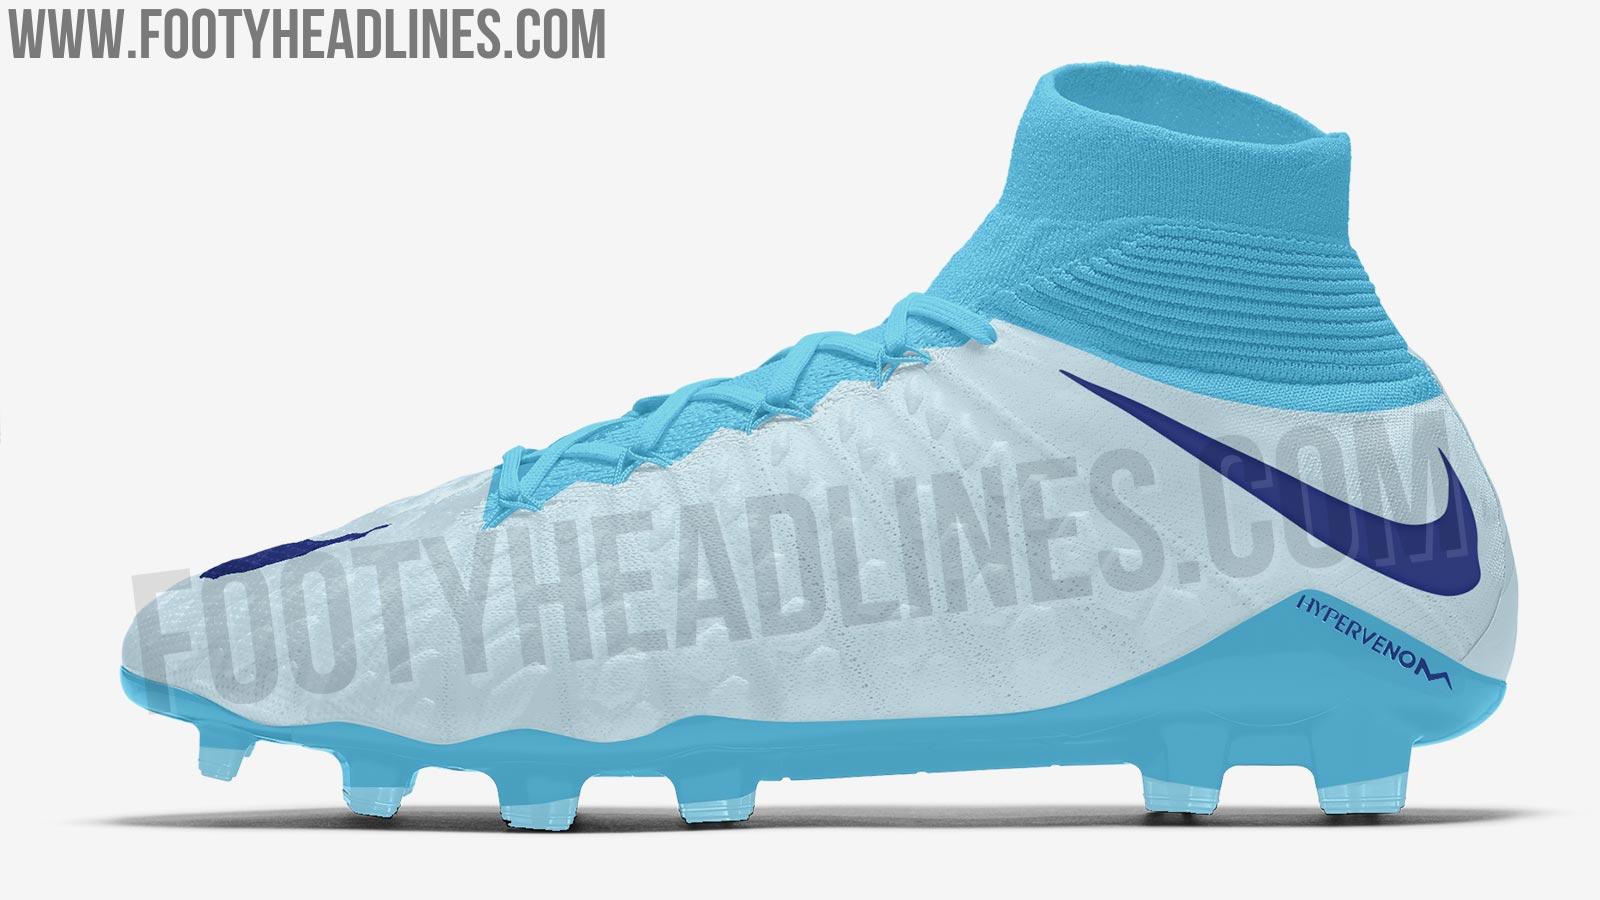 eef4a08c8641 Glacier Blue  Nike Hypervenom Phantom III 2018 Boots Leaked